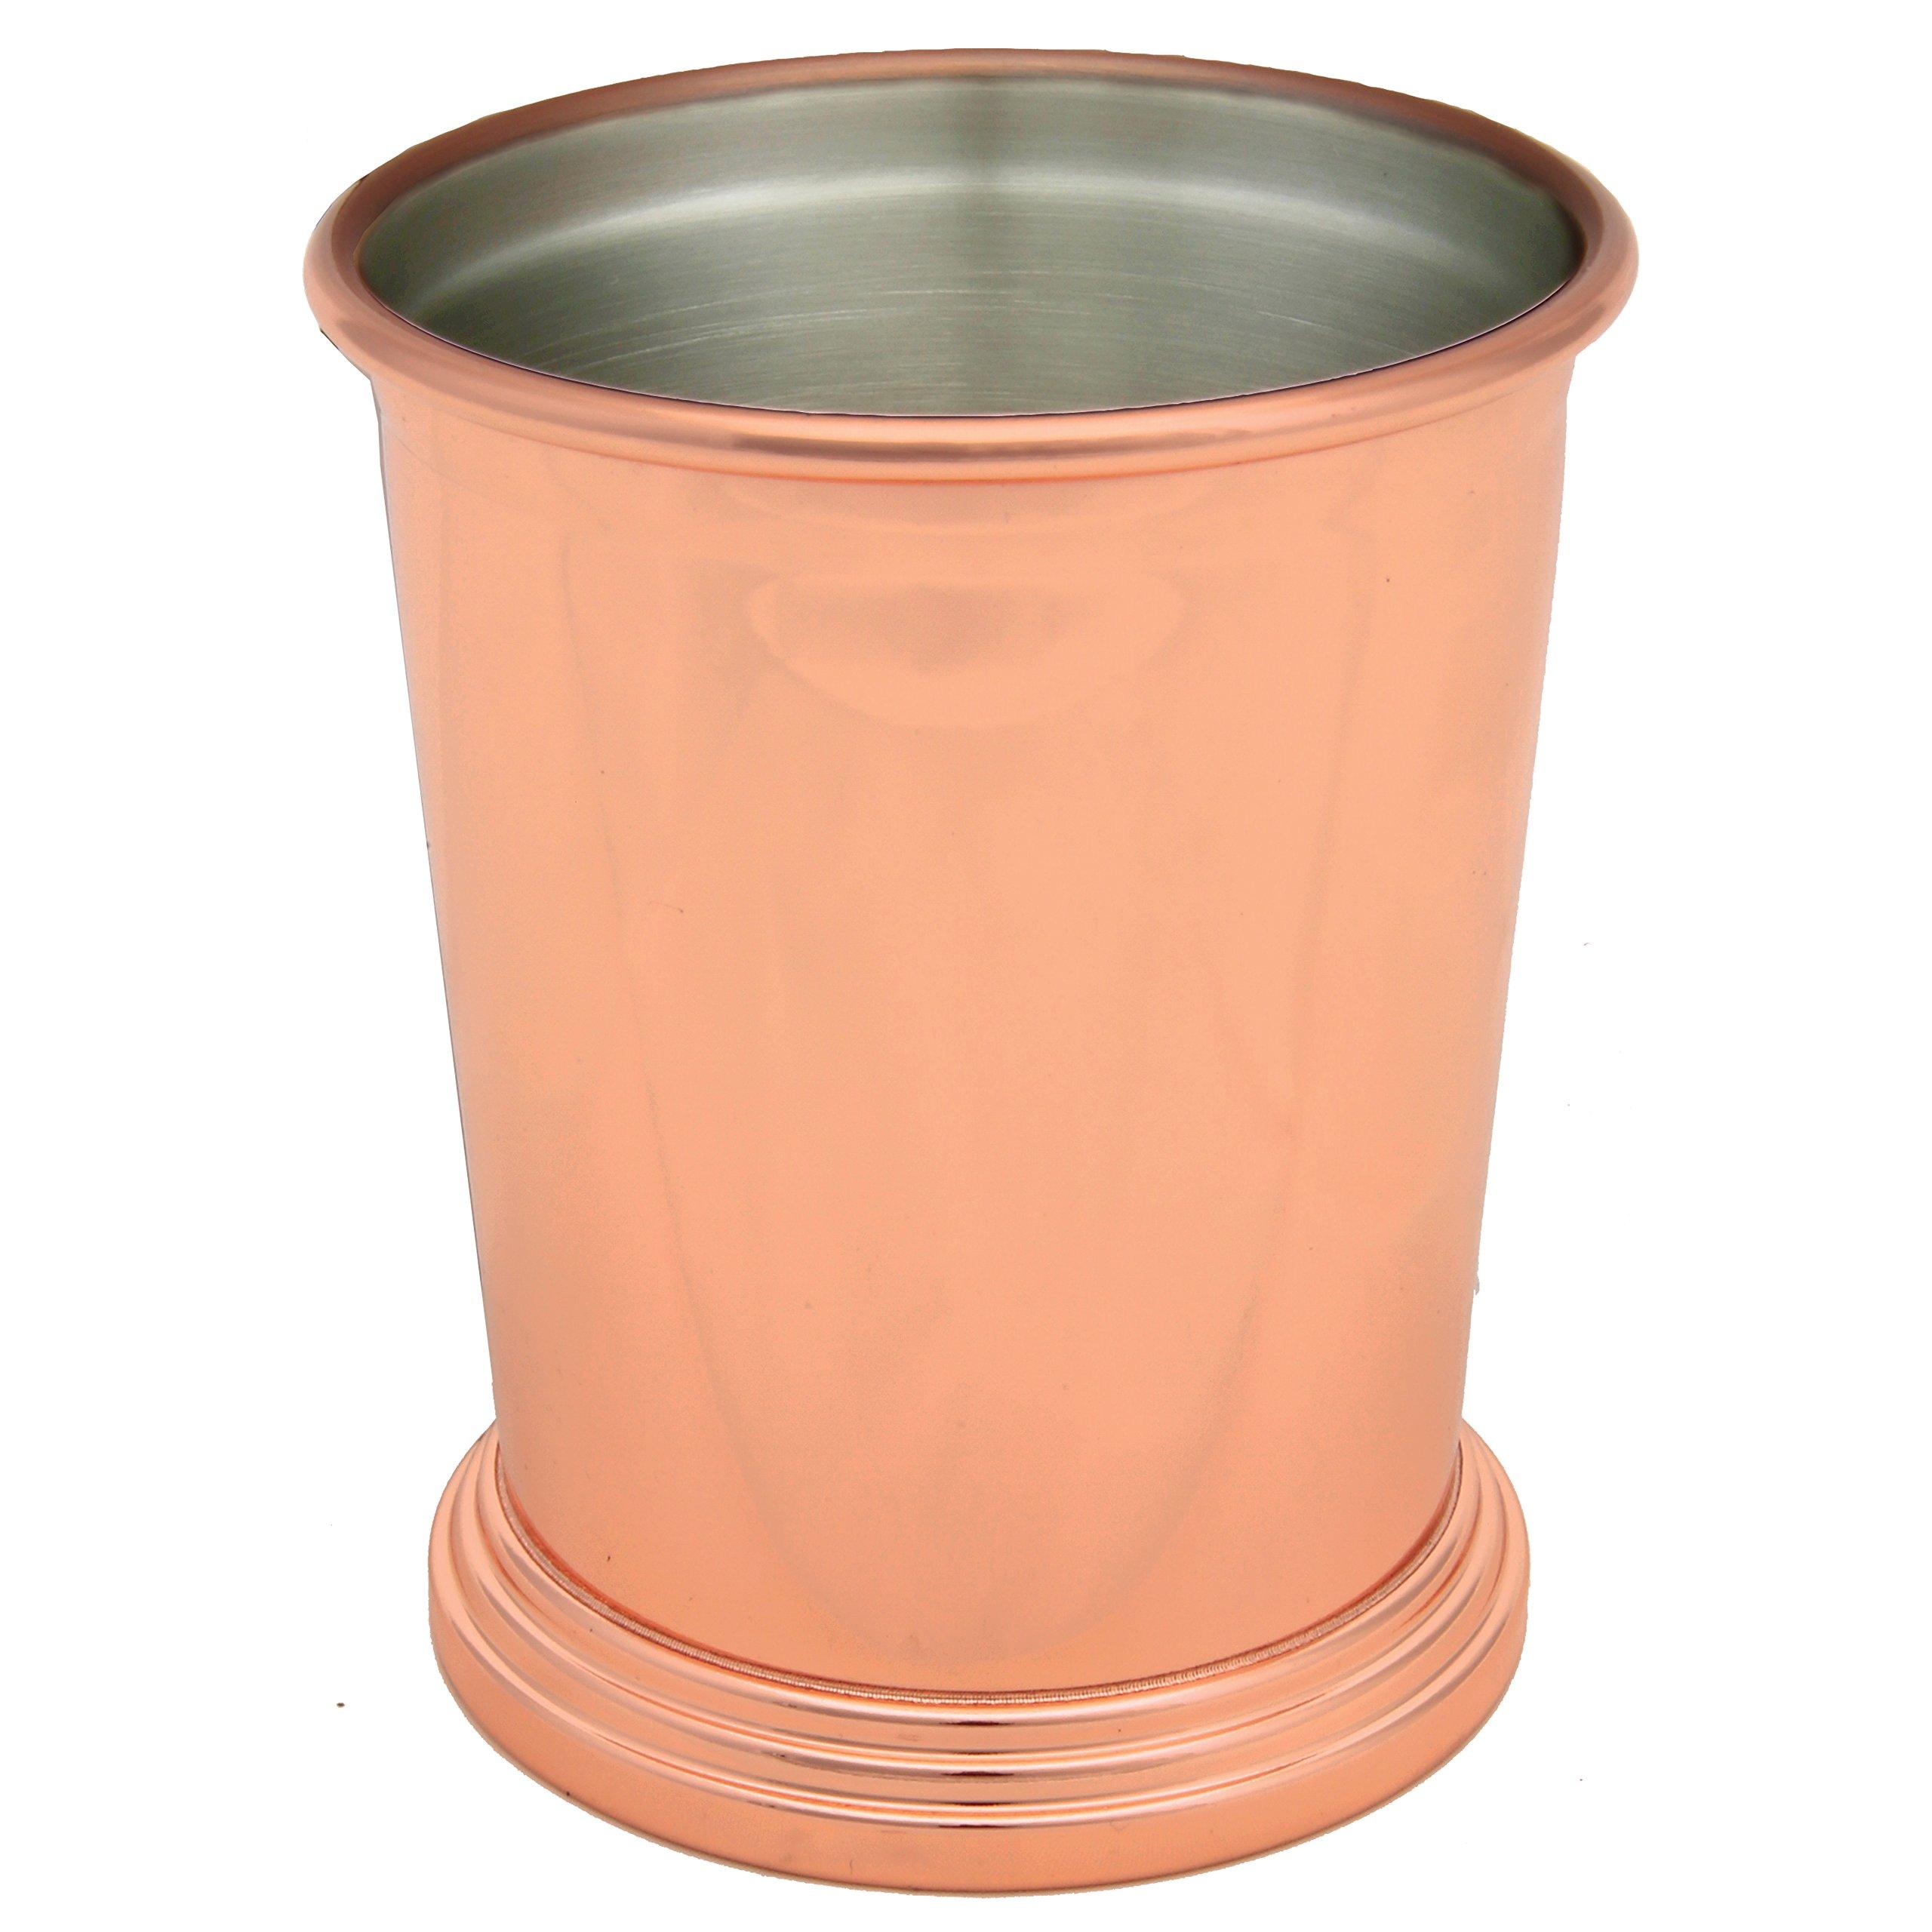 Vastigo 14 oz Mint Julep Cup w/Elegant Stainless Steel Body - Rose Gold